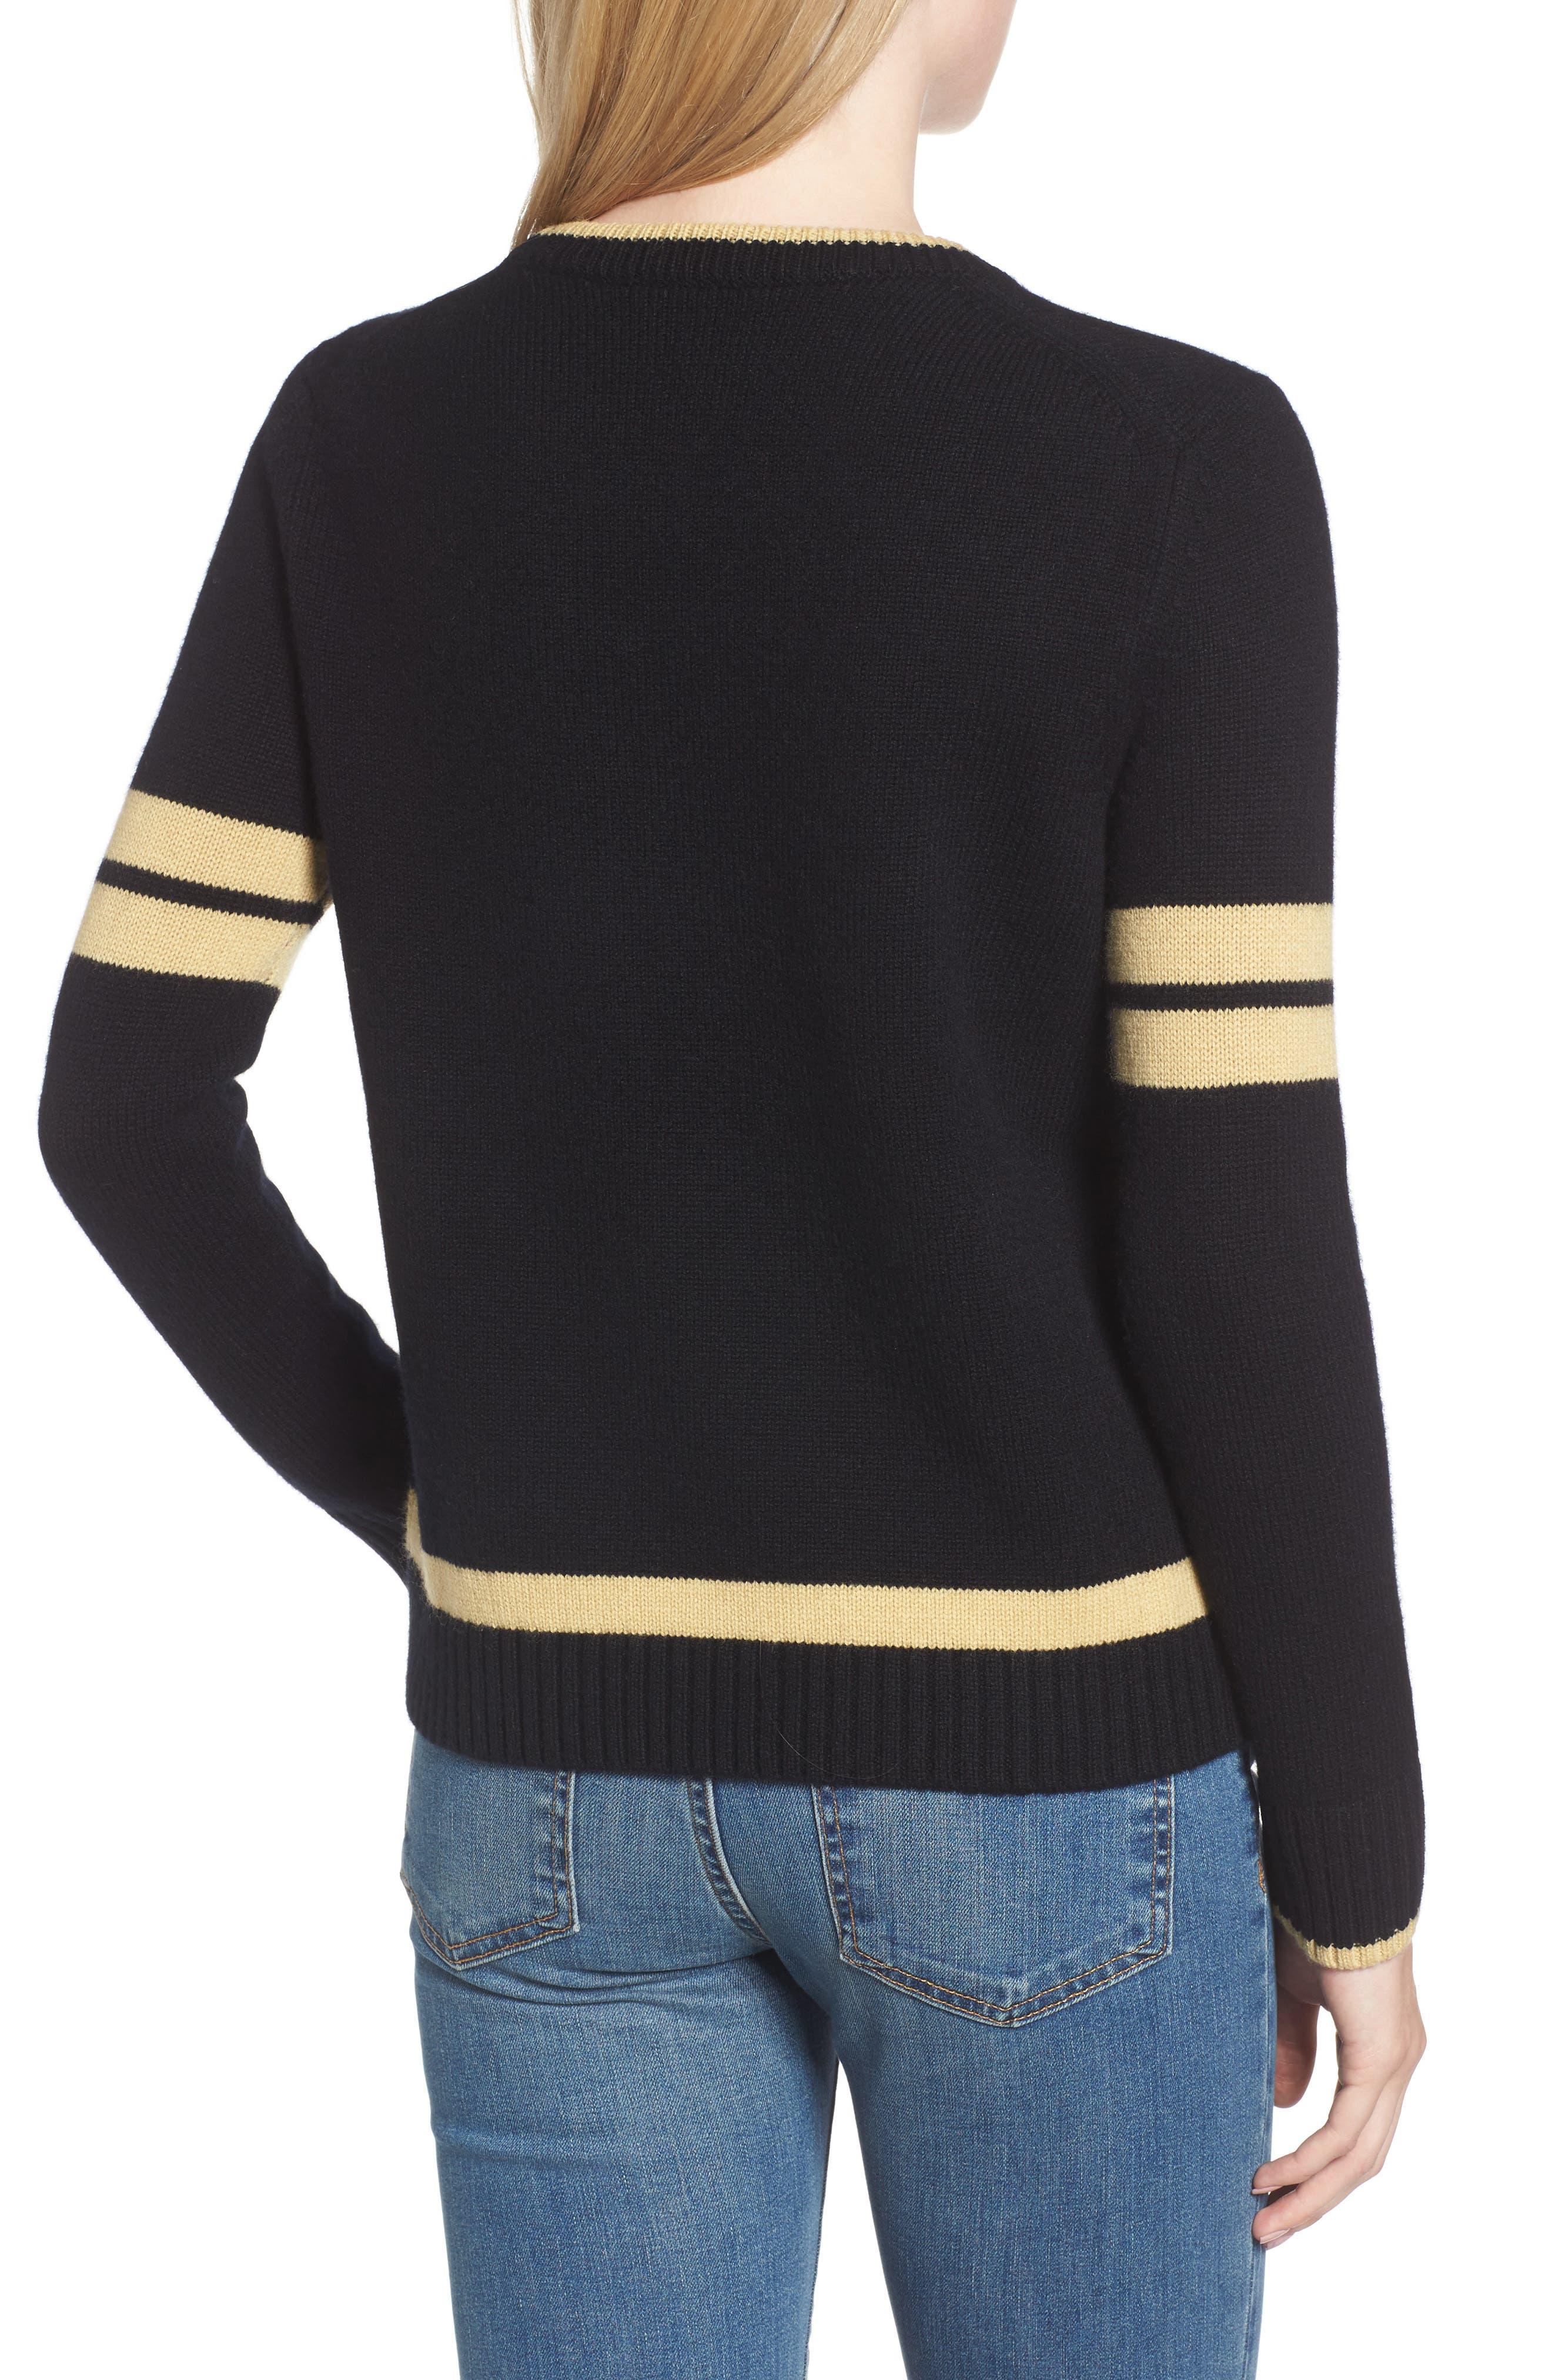 Spirit Sweater,                             Alternate thumbnail 2, color,                             Black/ Gold